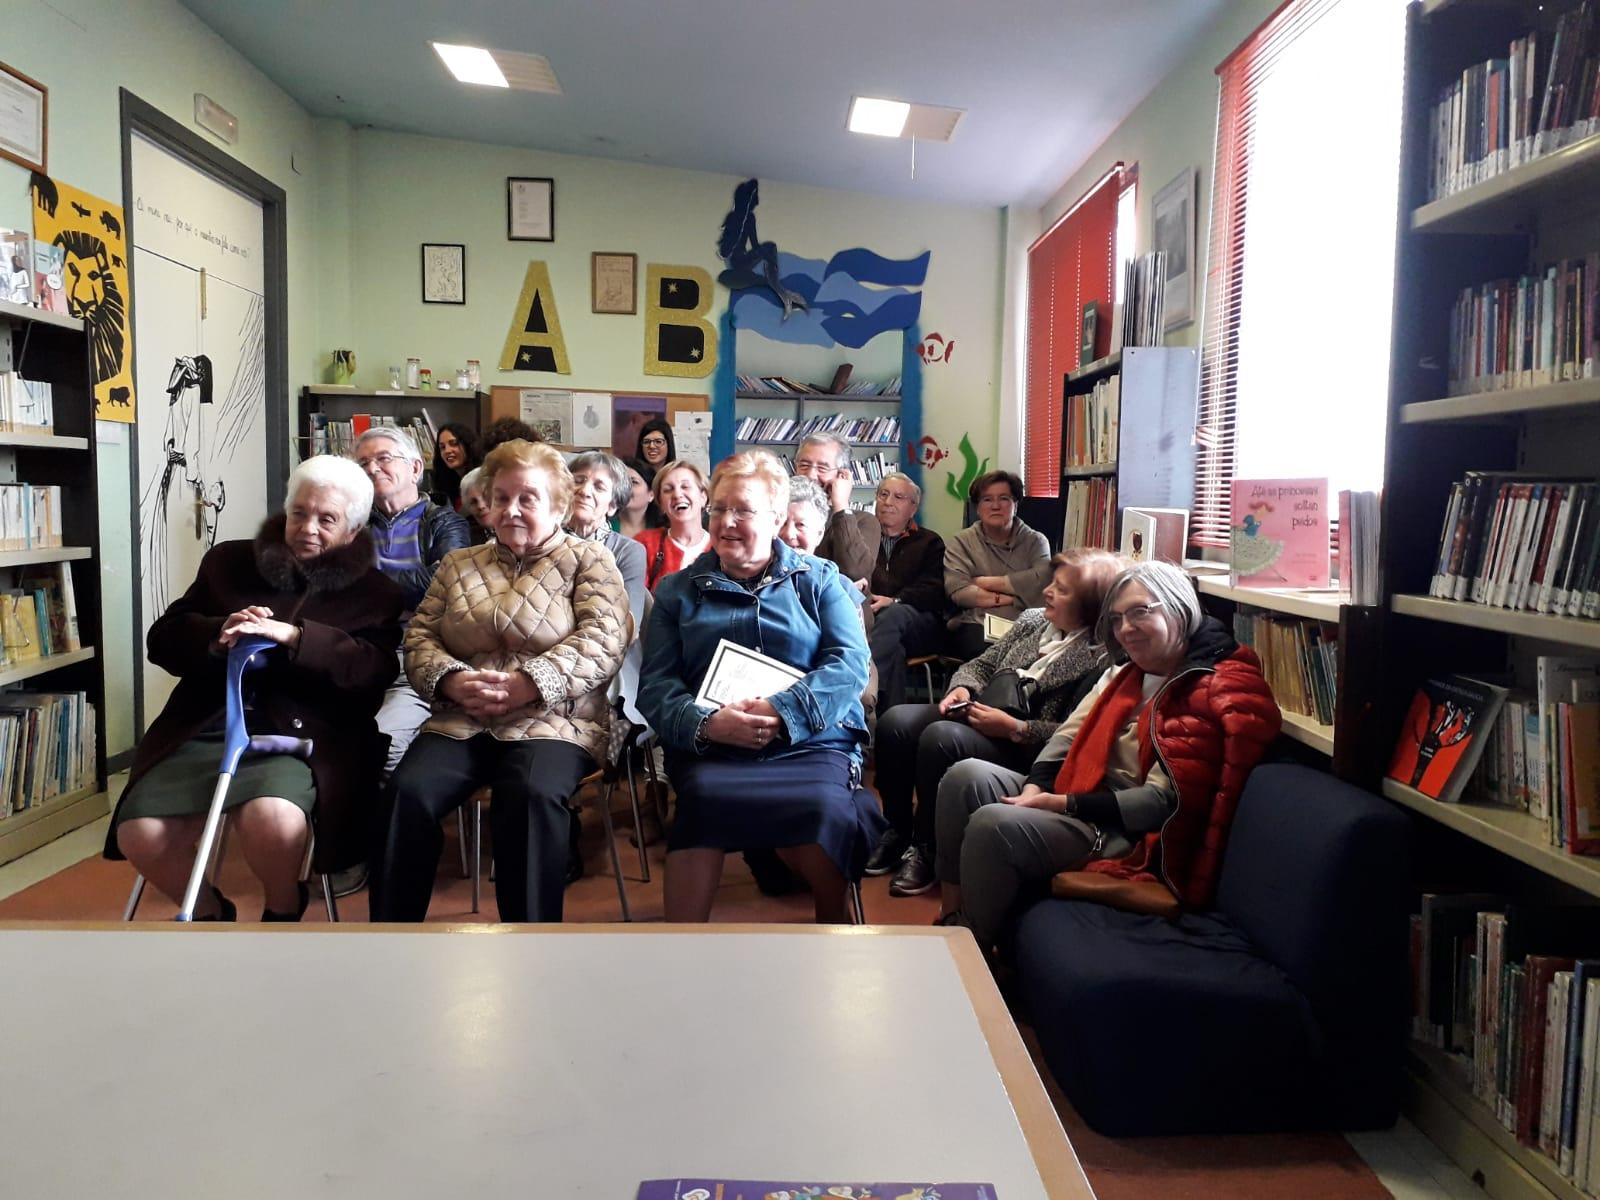 Presentación Cairon, biblioteca municipal de Antas de Ulla, Instituto de Estudos Ulloáns